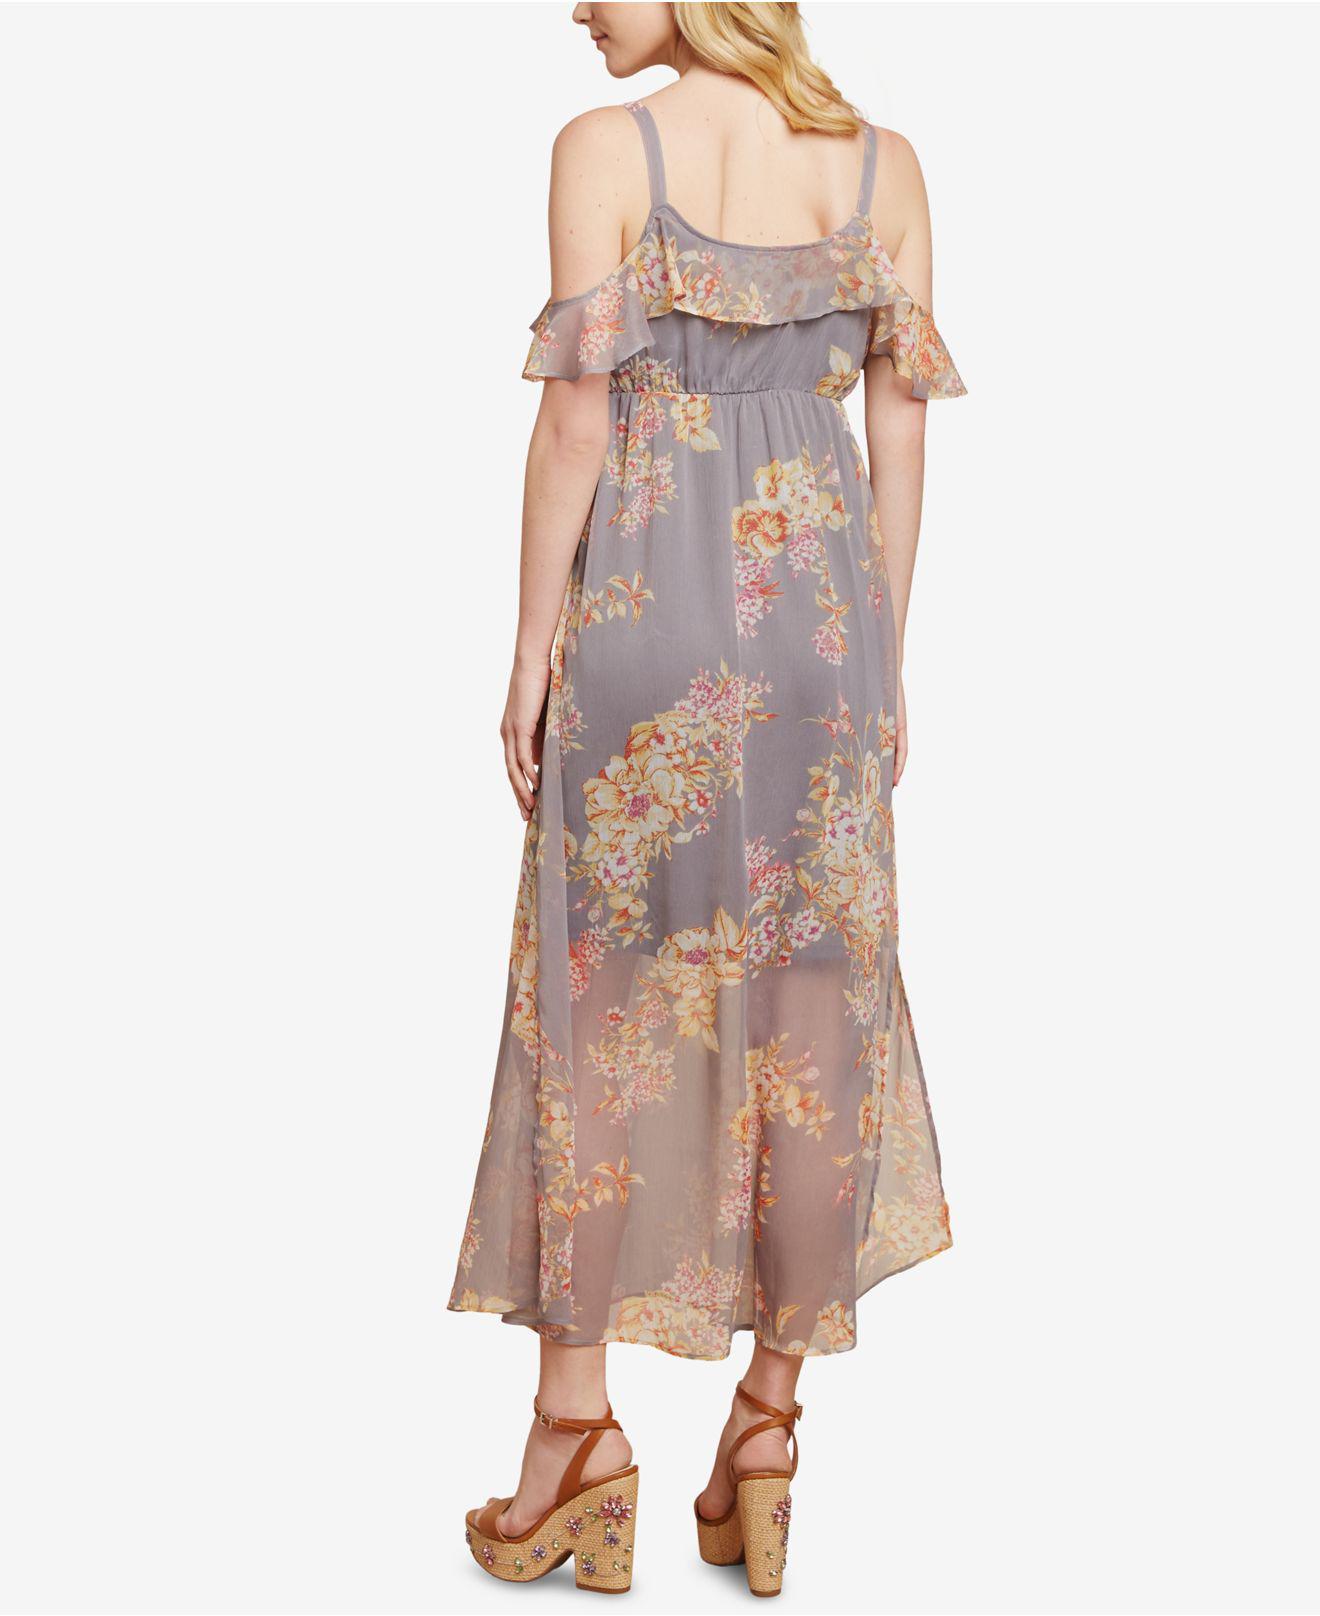 d0facf6e1eb Jessica Simpson Sleeveless Ruffled Maternity Maxi Dress in Gray - Lyst